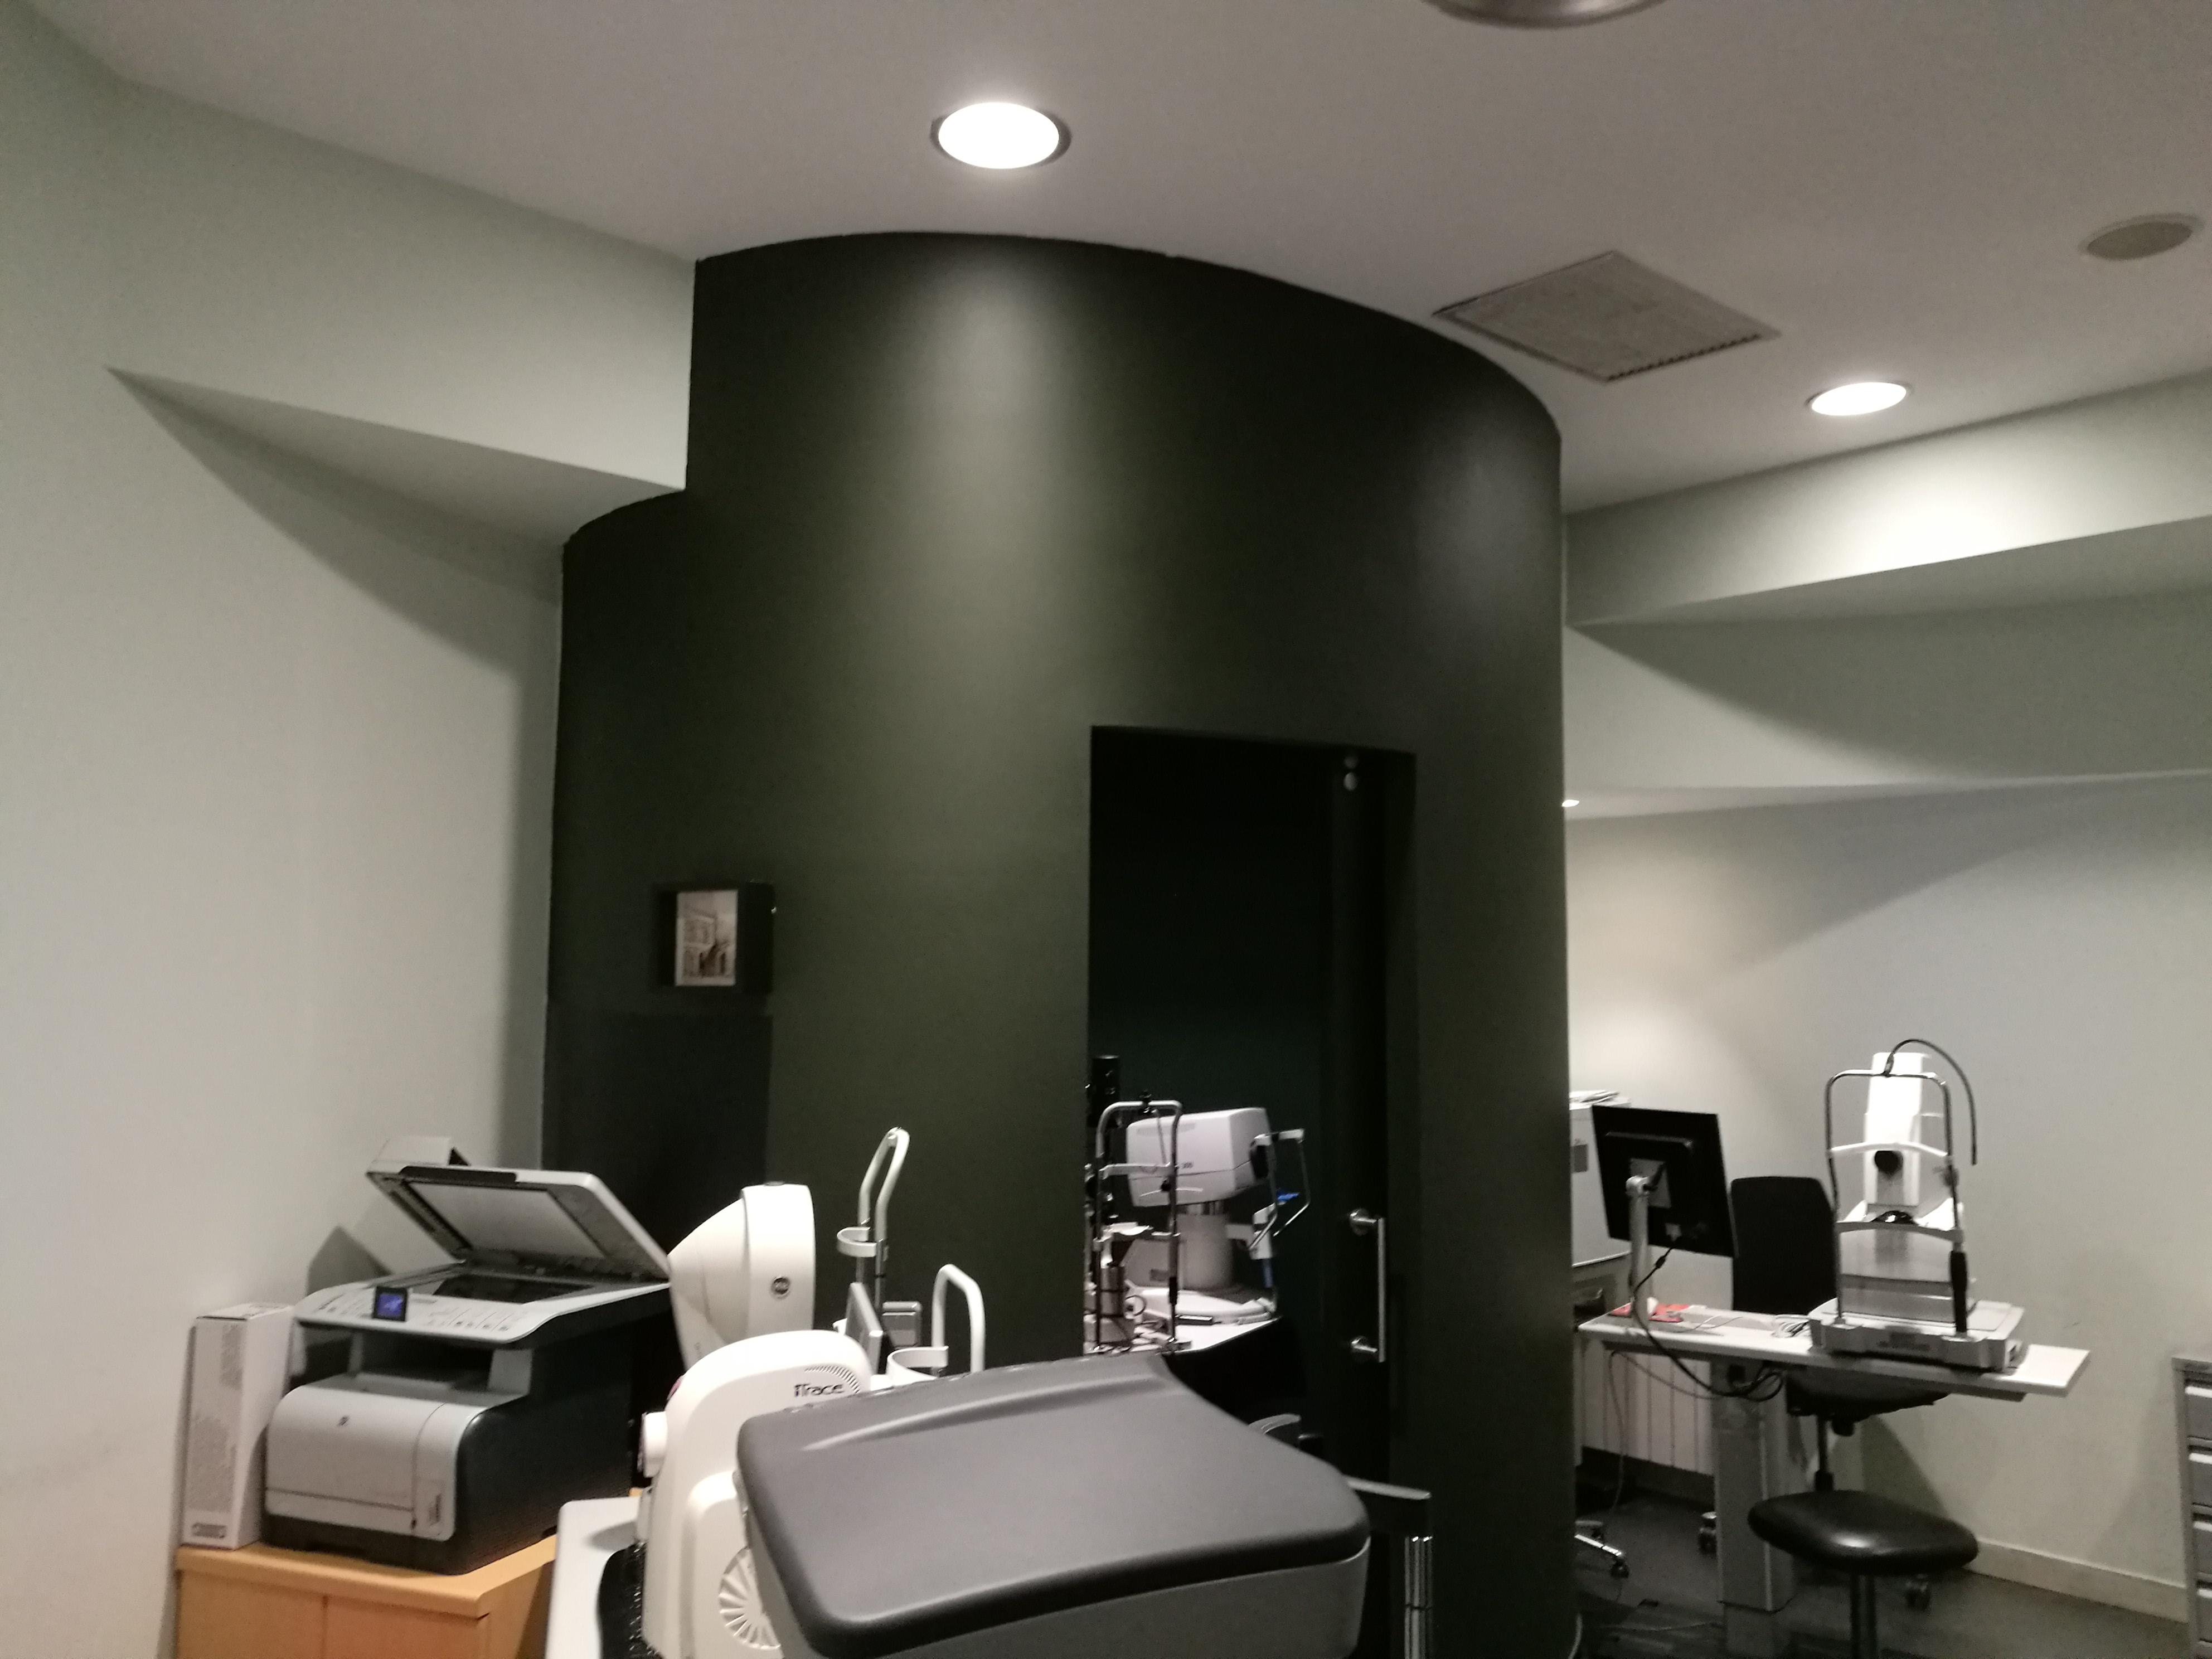 Grupo Empresarial PLAZALED -  ILUMINACIÓN LED - PLAZALED rótulos led electrónicos, pantallas led electrónicas